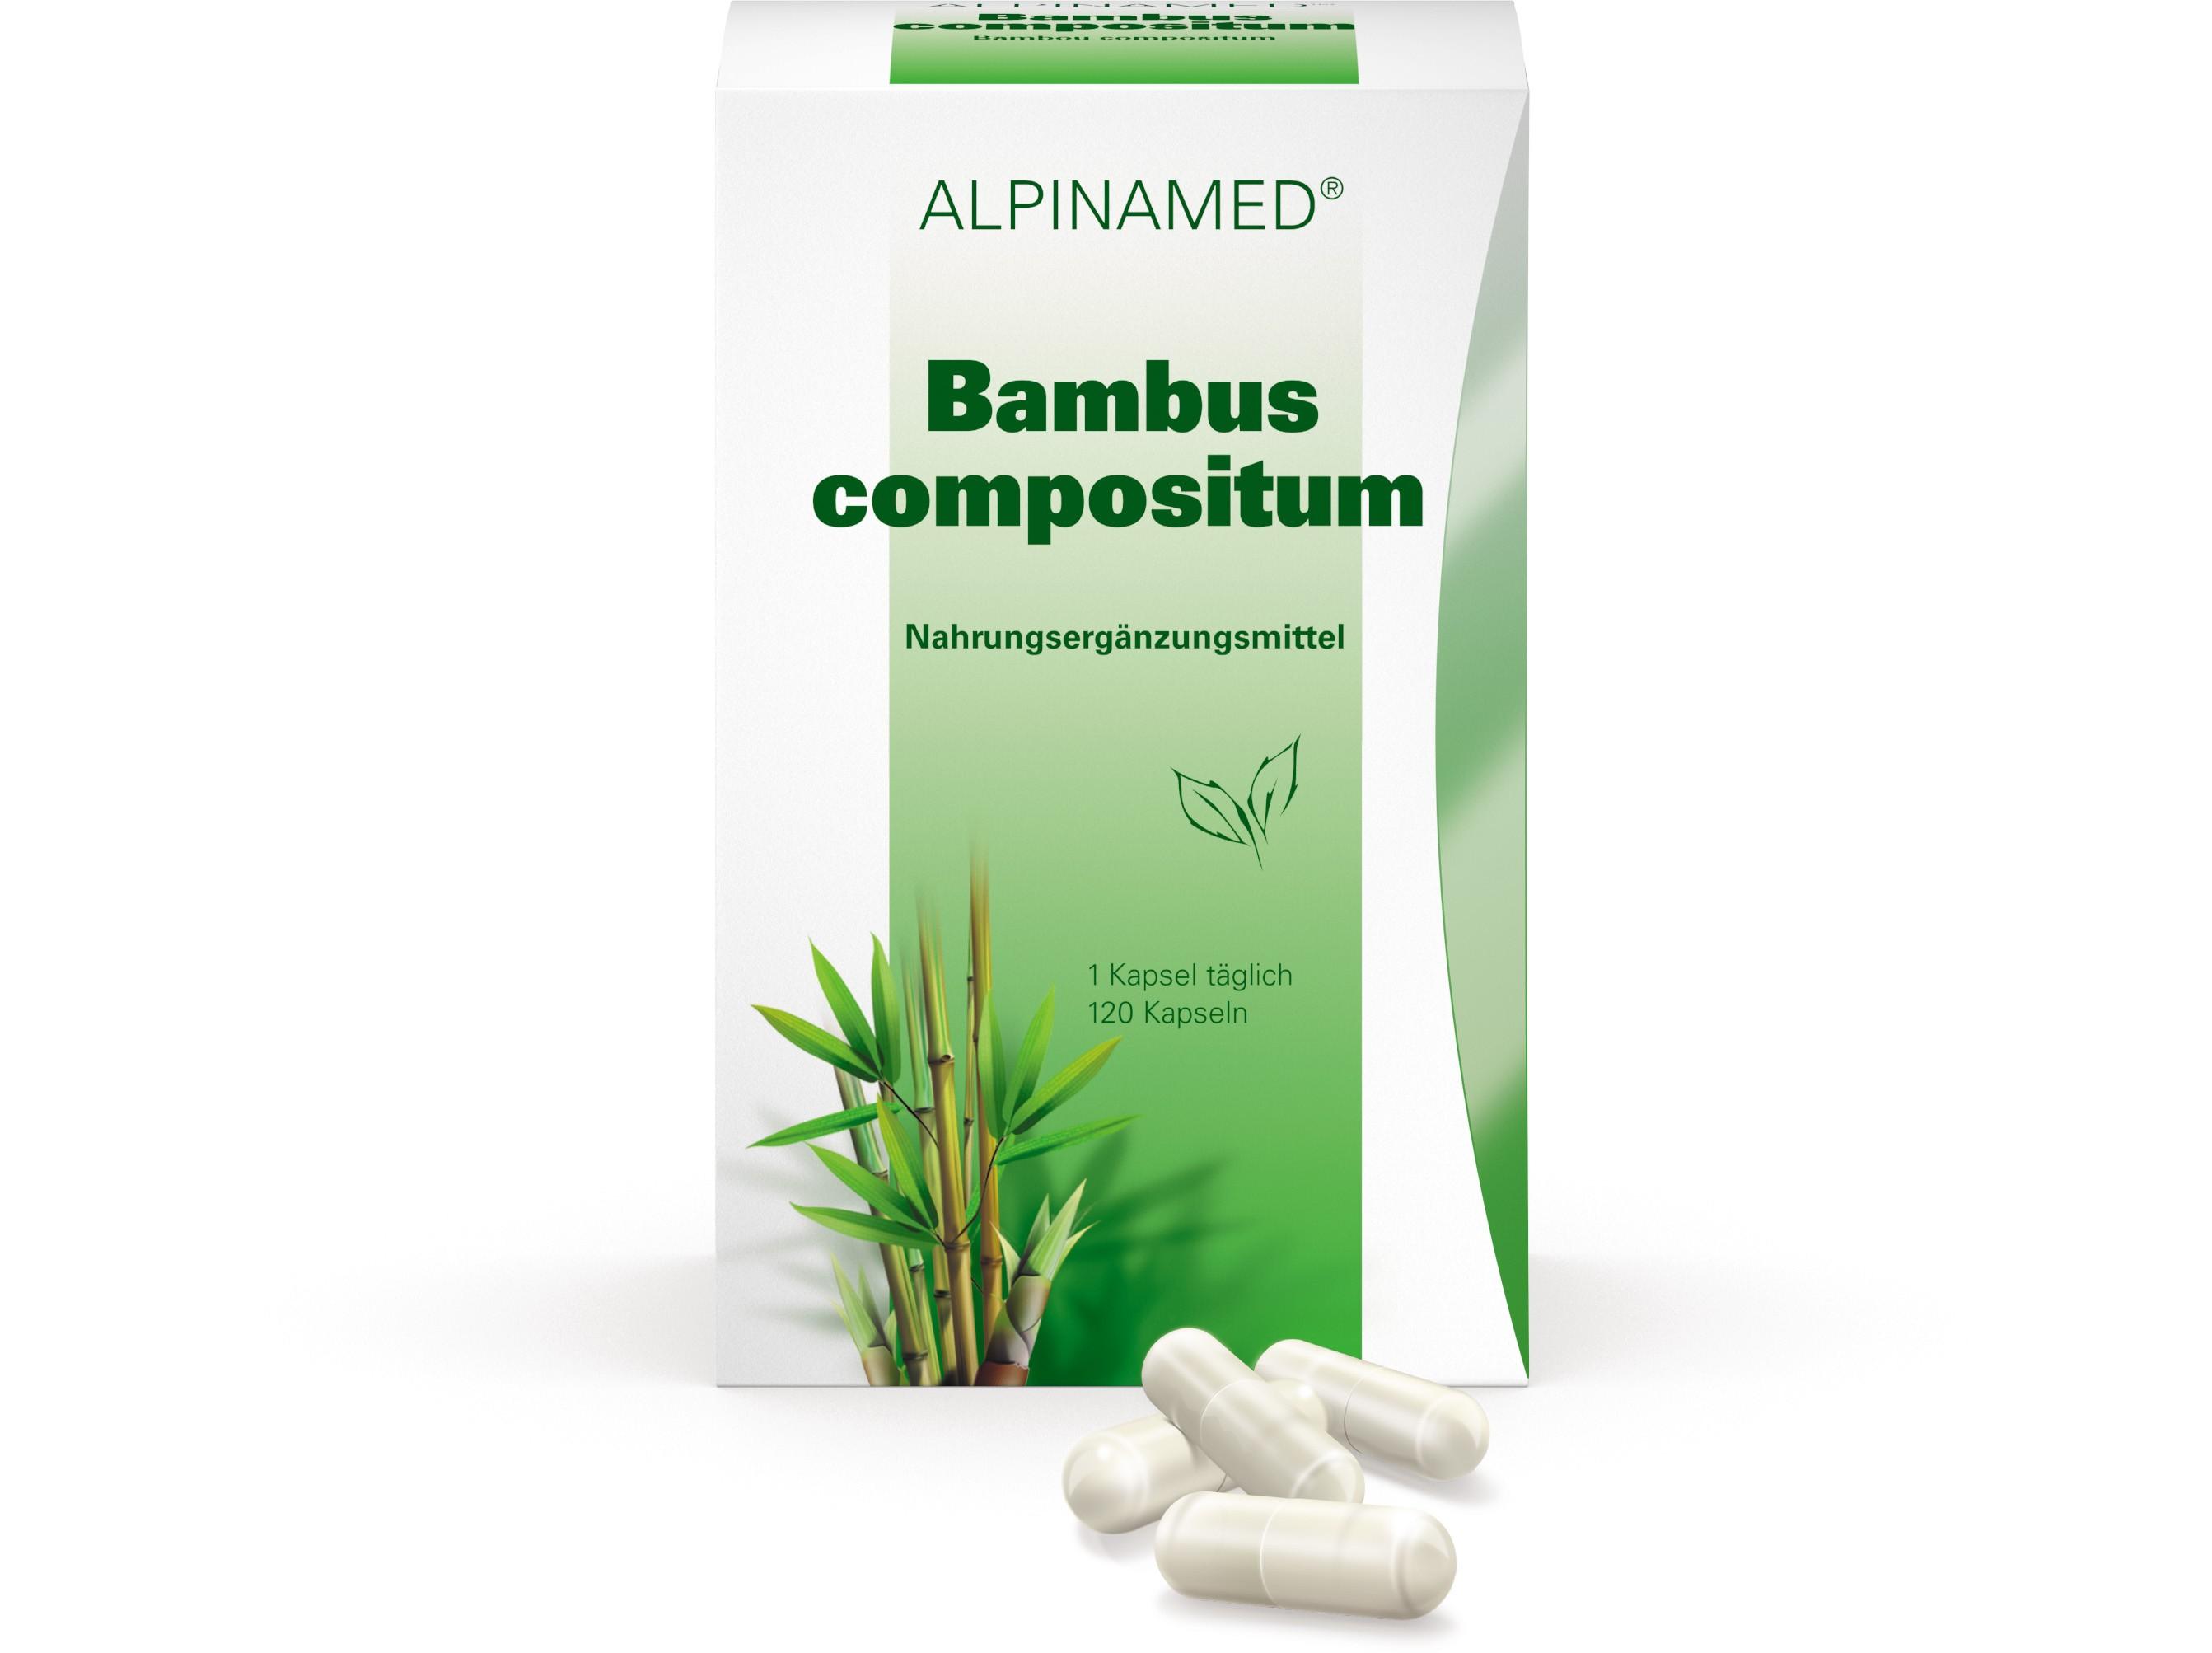 Image of Alpinamed Bambus compositum Kapseln (120 Stk)